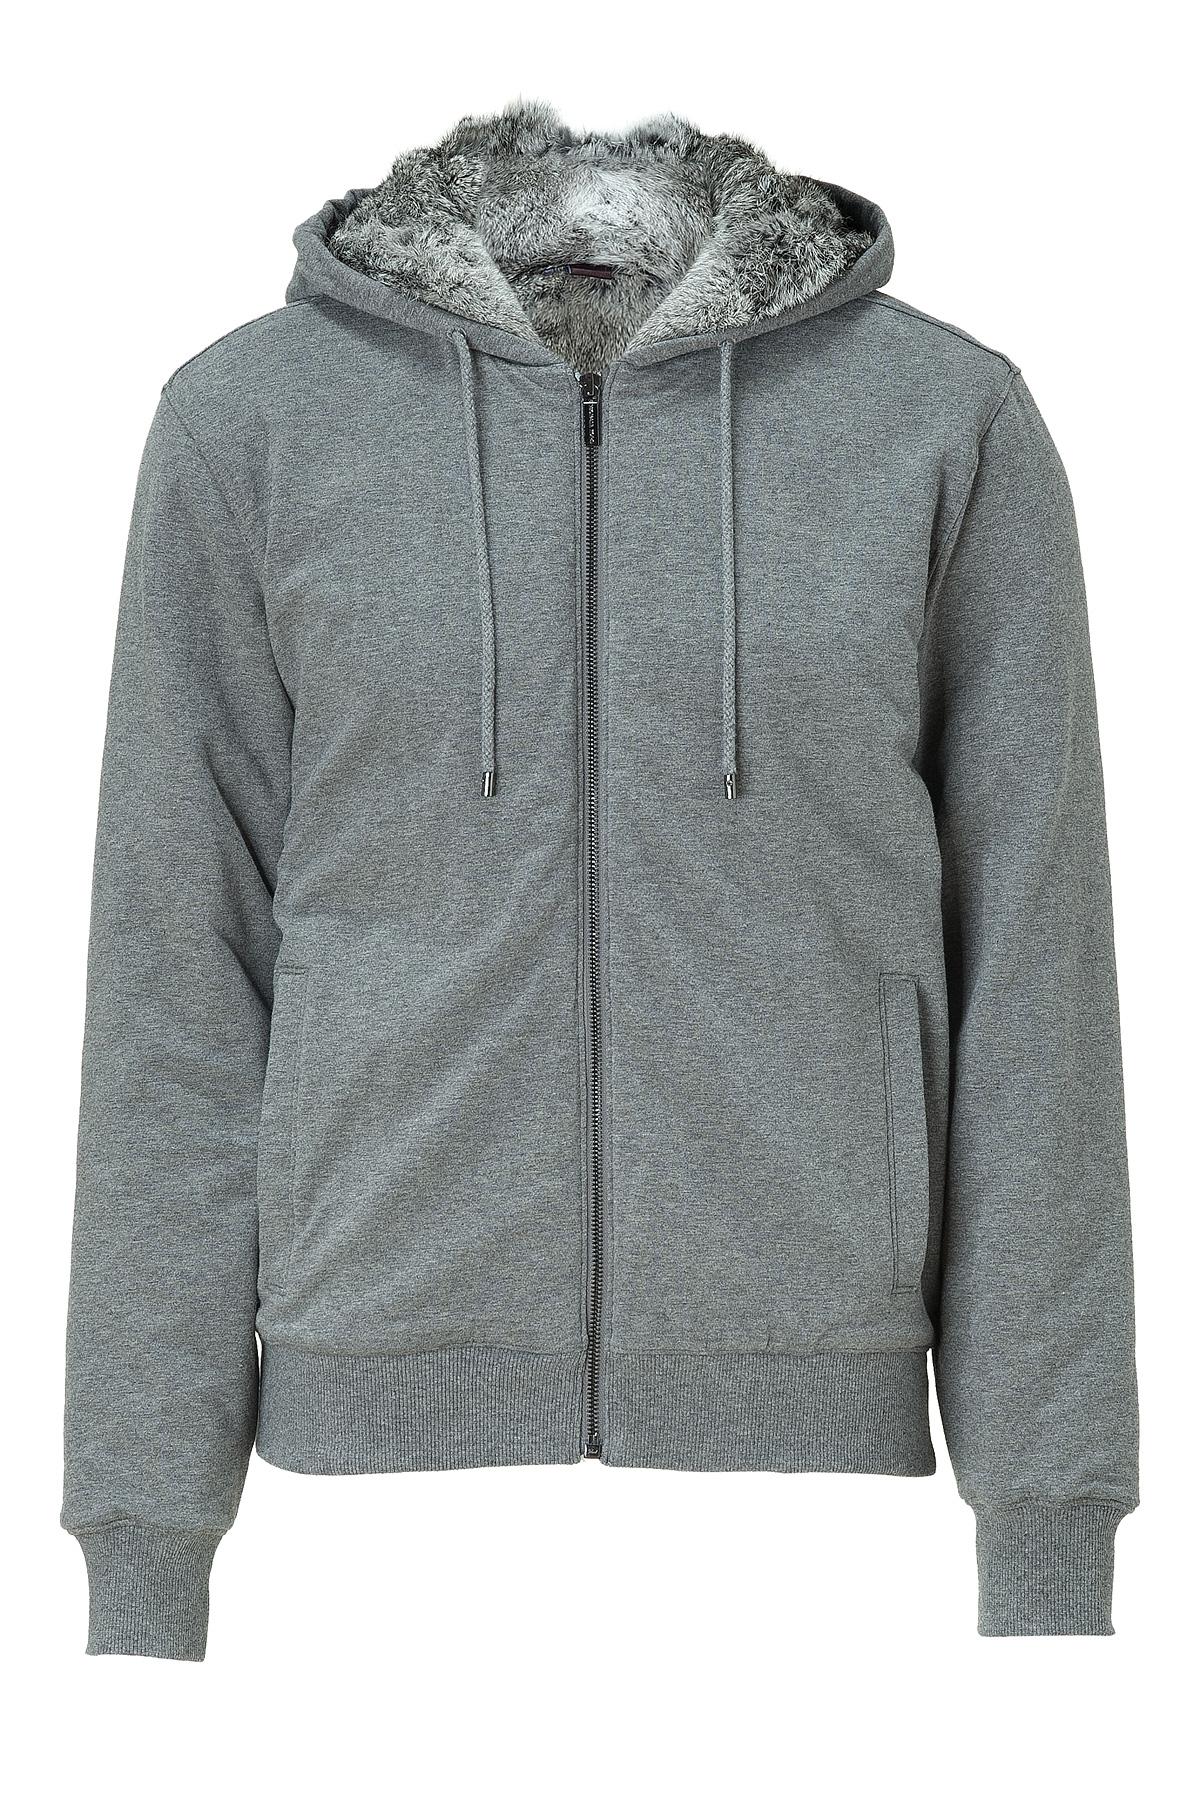 Lyst Michael Kors Ash Fur Lined Zip Hoodie In Gray For Men